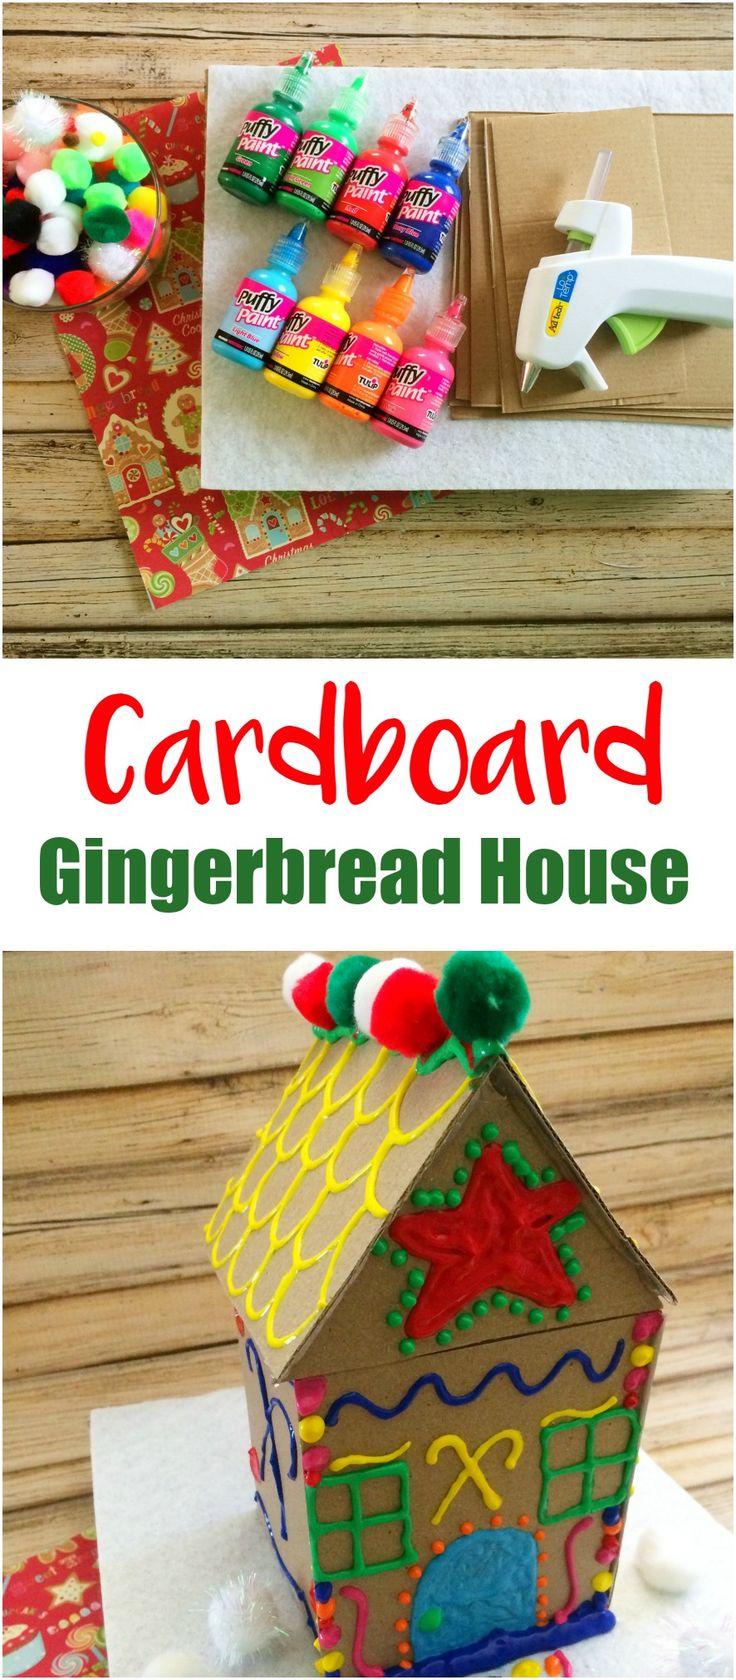 Make Your Own Cardboard Gingerbread House Crafts Make